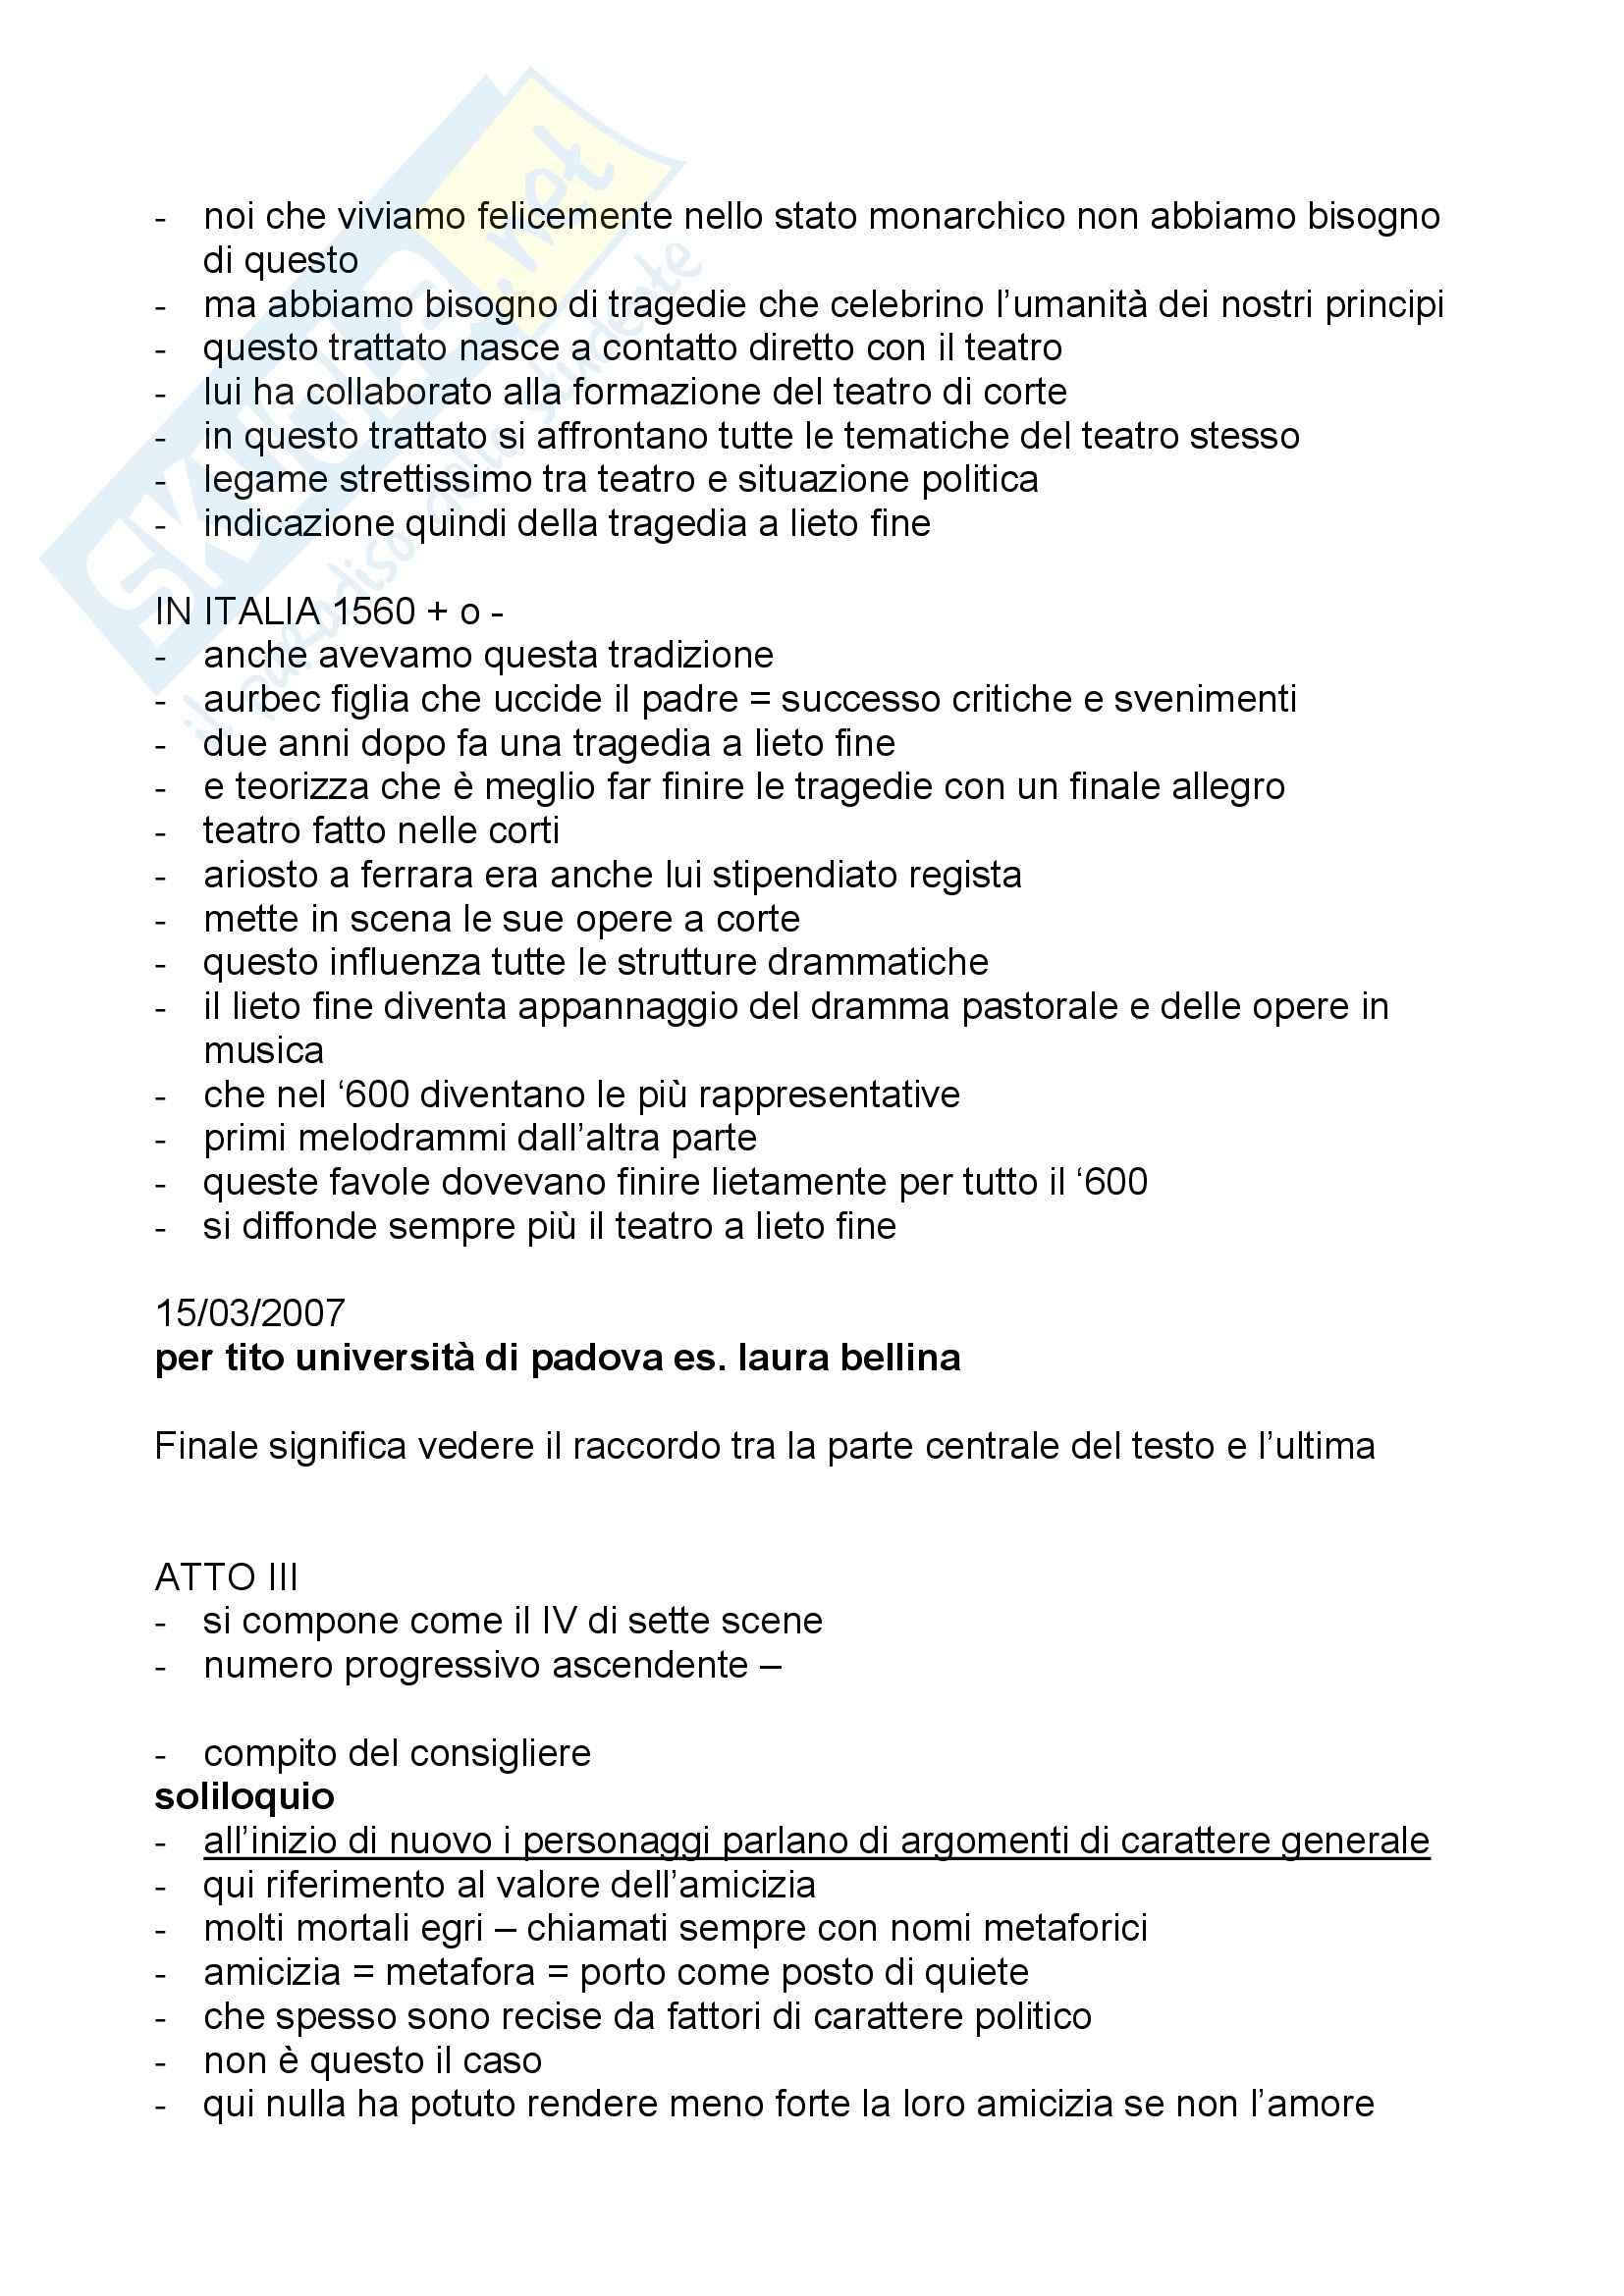 Letteratura teatrale italiana - teatro regolare Pag. 11